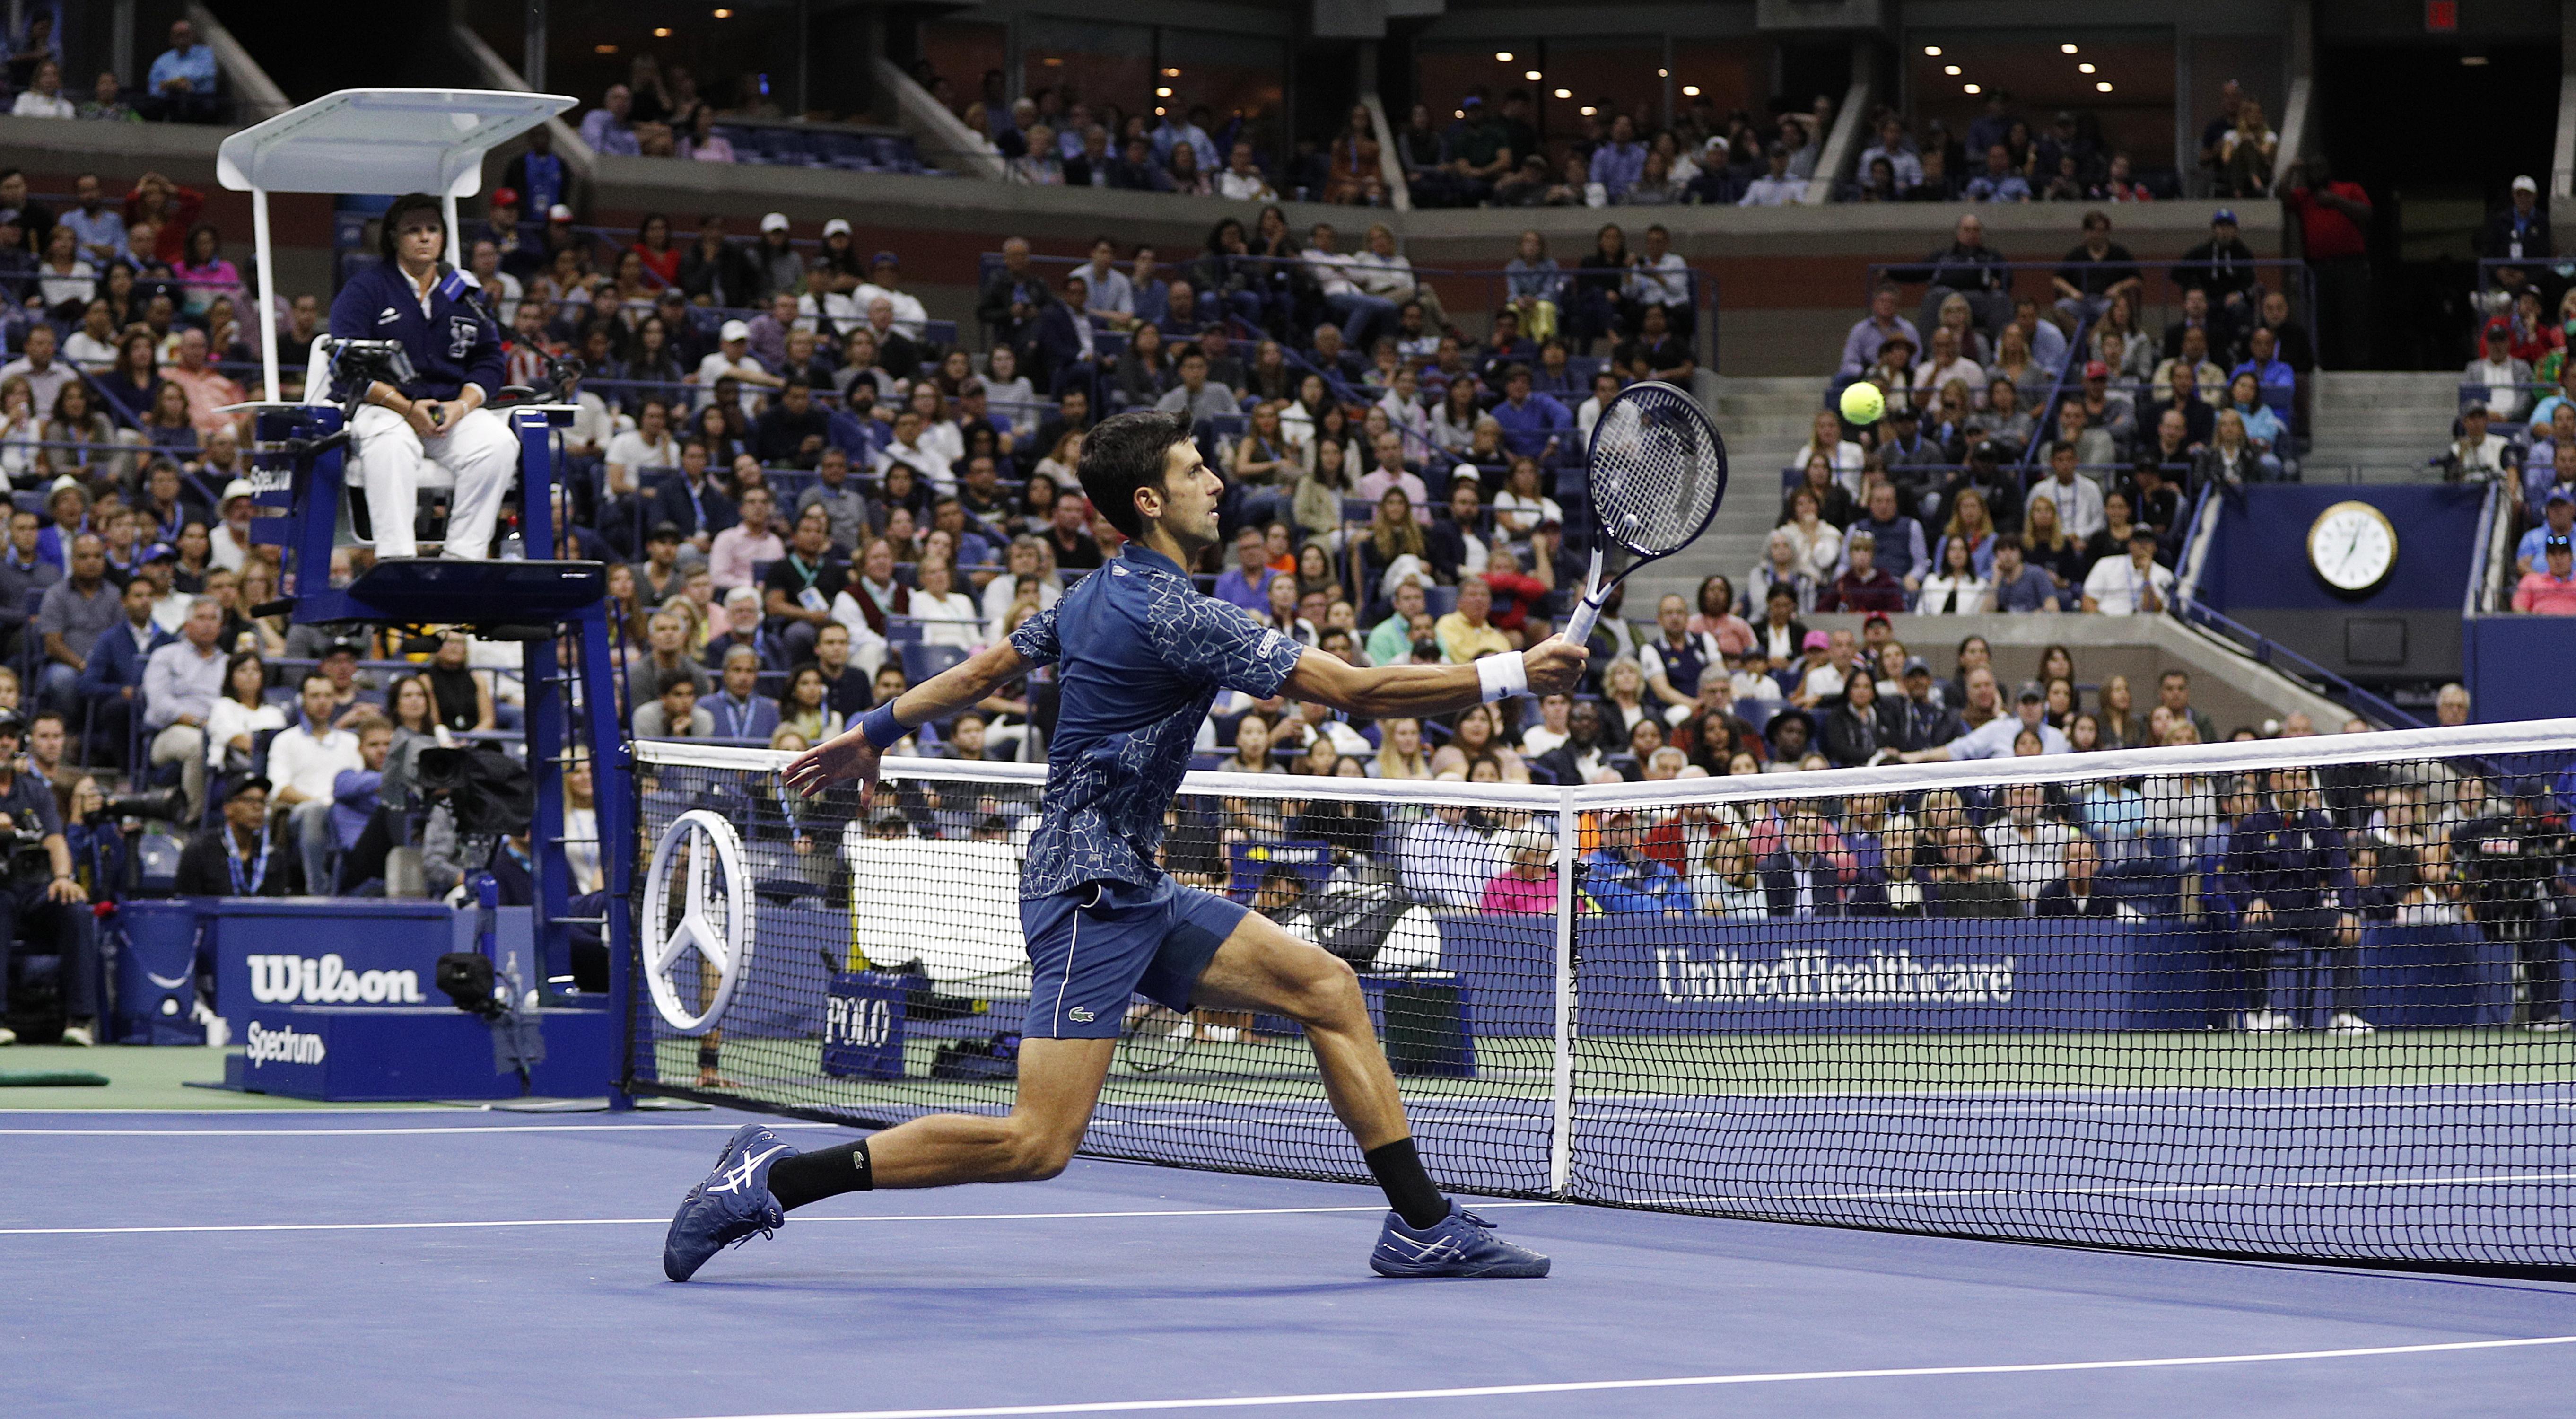 Novak Djokovic won in straight sets in New York